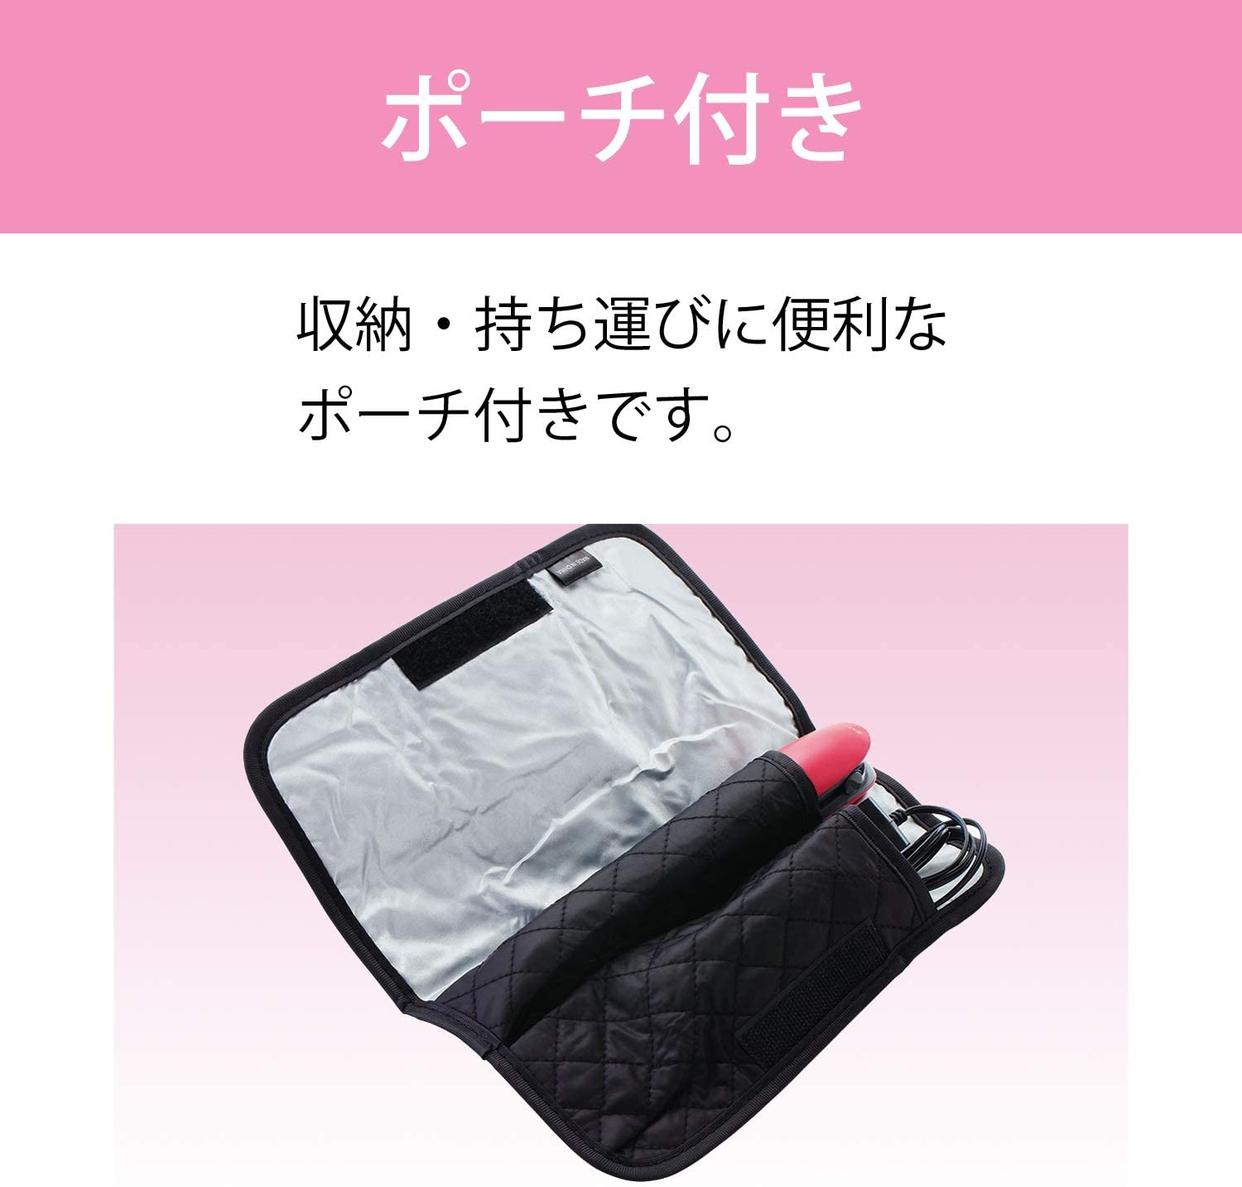 KOIZUMI(コイズミ) コードレスストレートアイロン KHS-8620の商品画像5